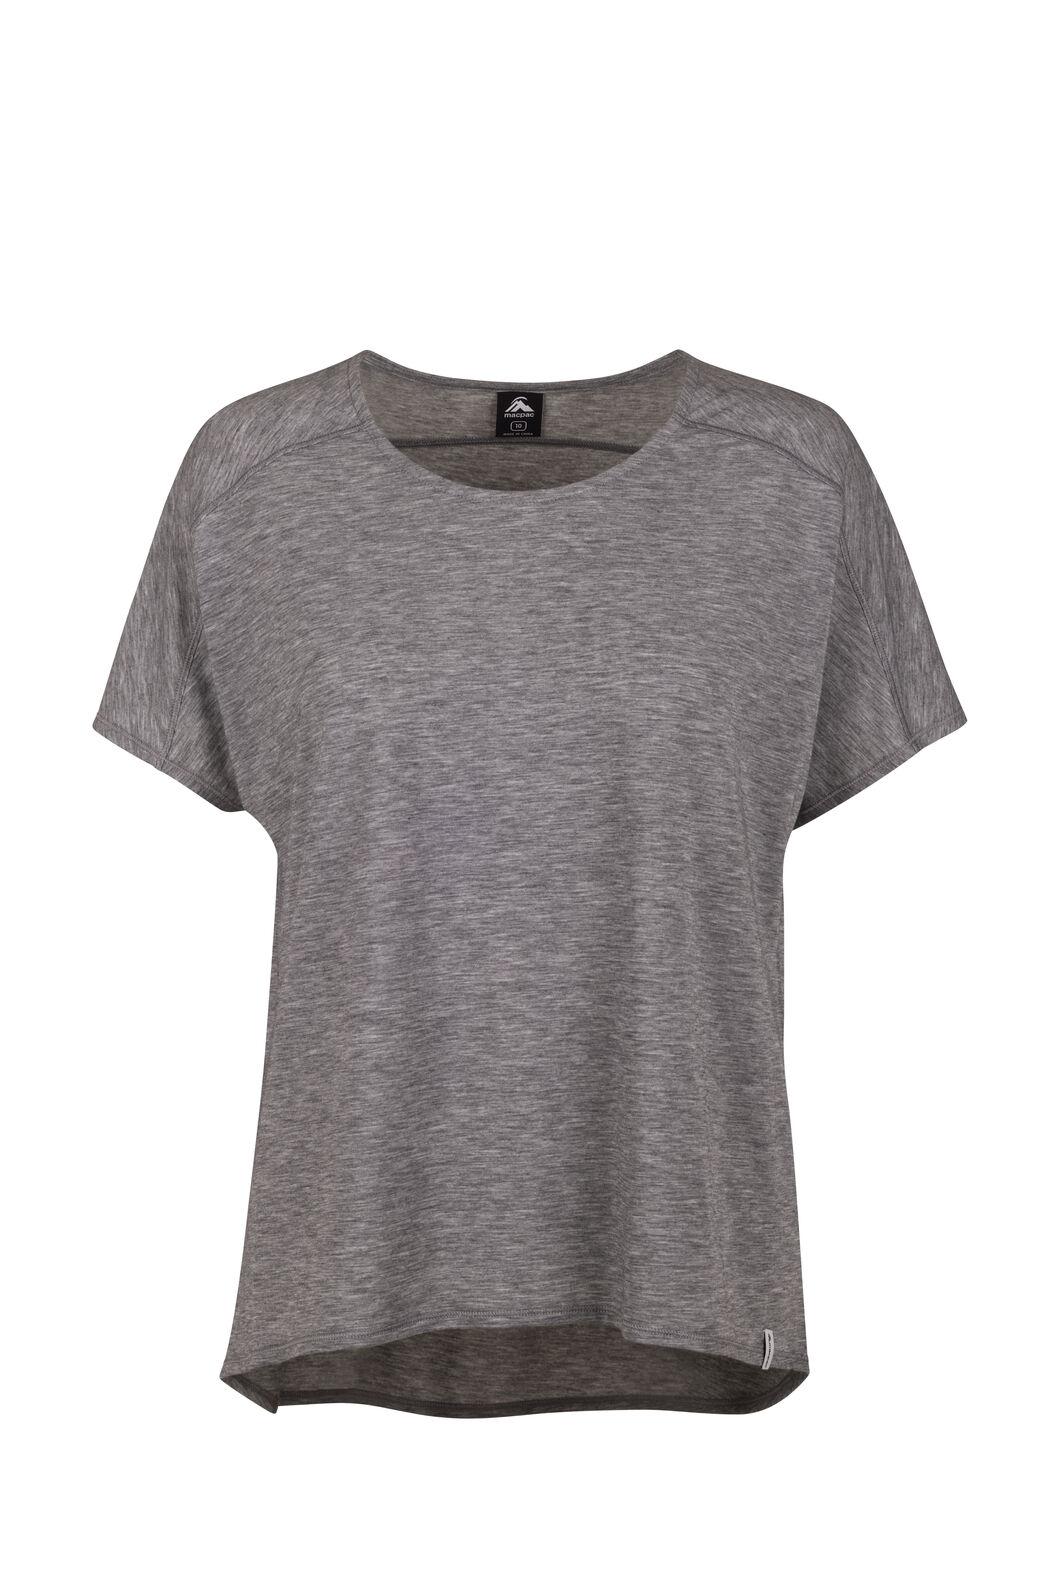 Macpac Eva Short Sleeve Tee — Women's, Anthracite, hi-res